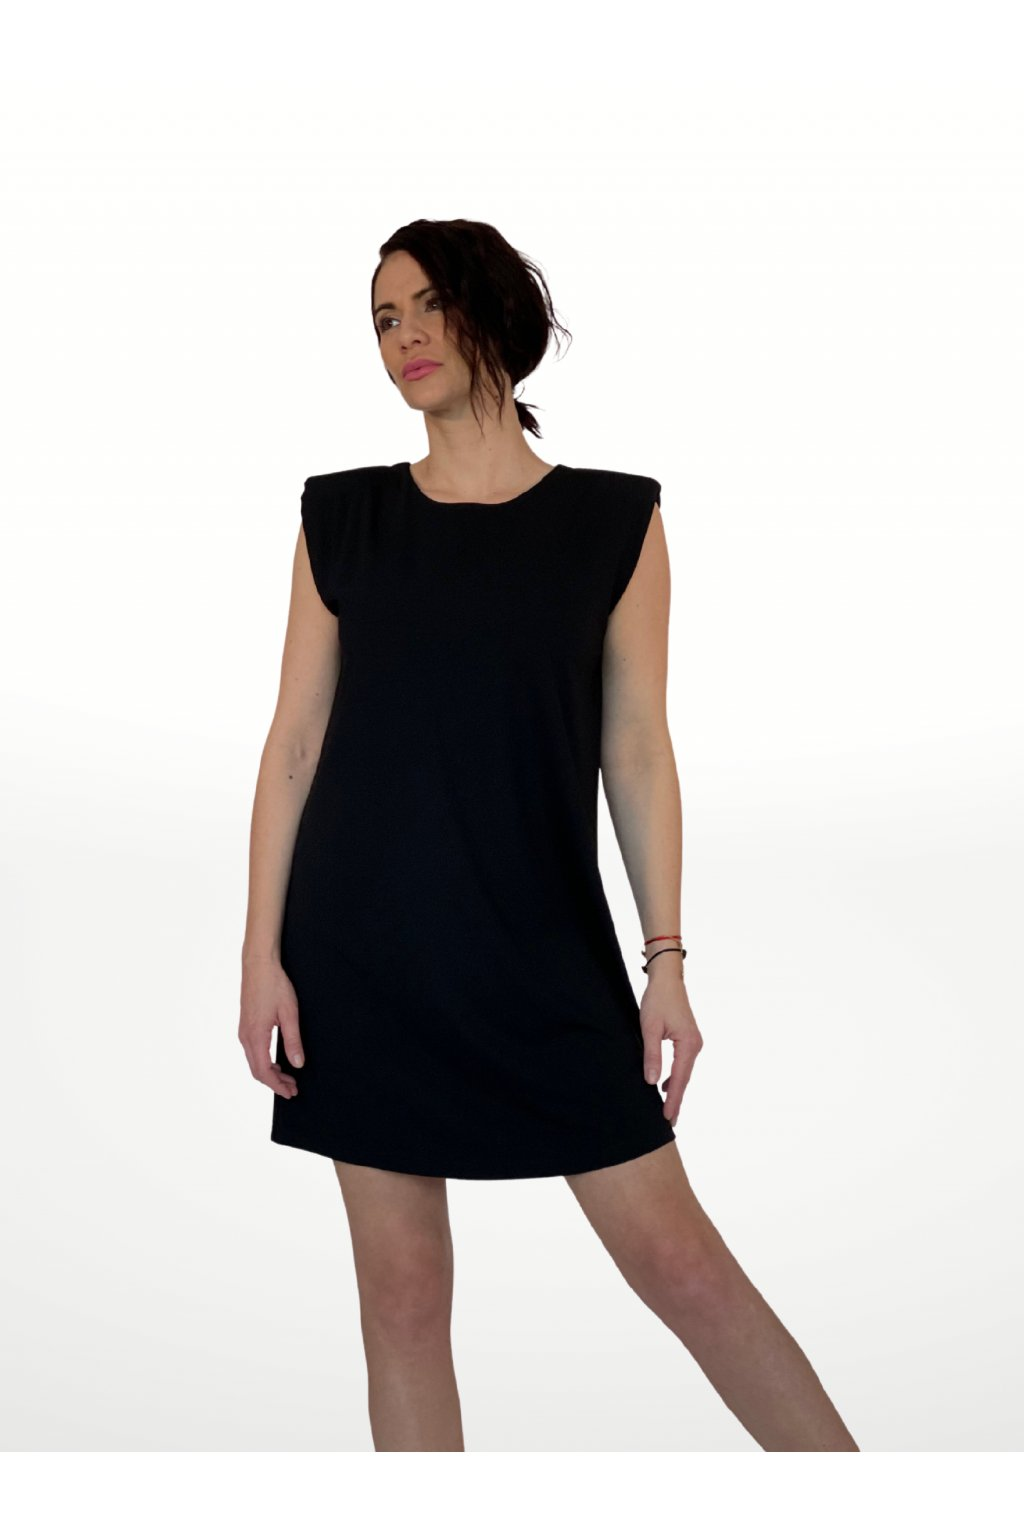 ALEX-dámském šaty s ramenními vycpávkami